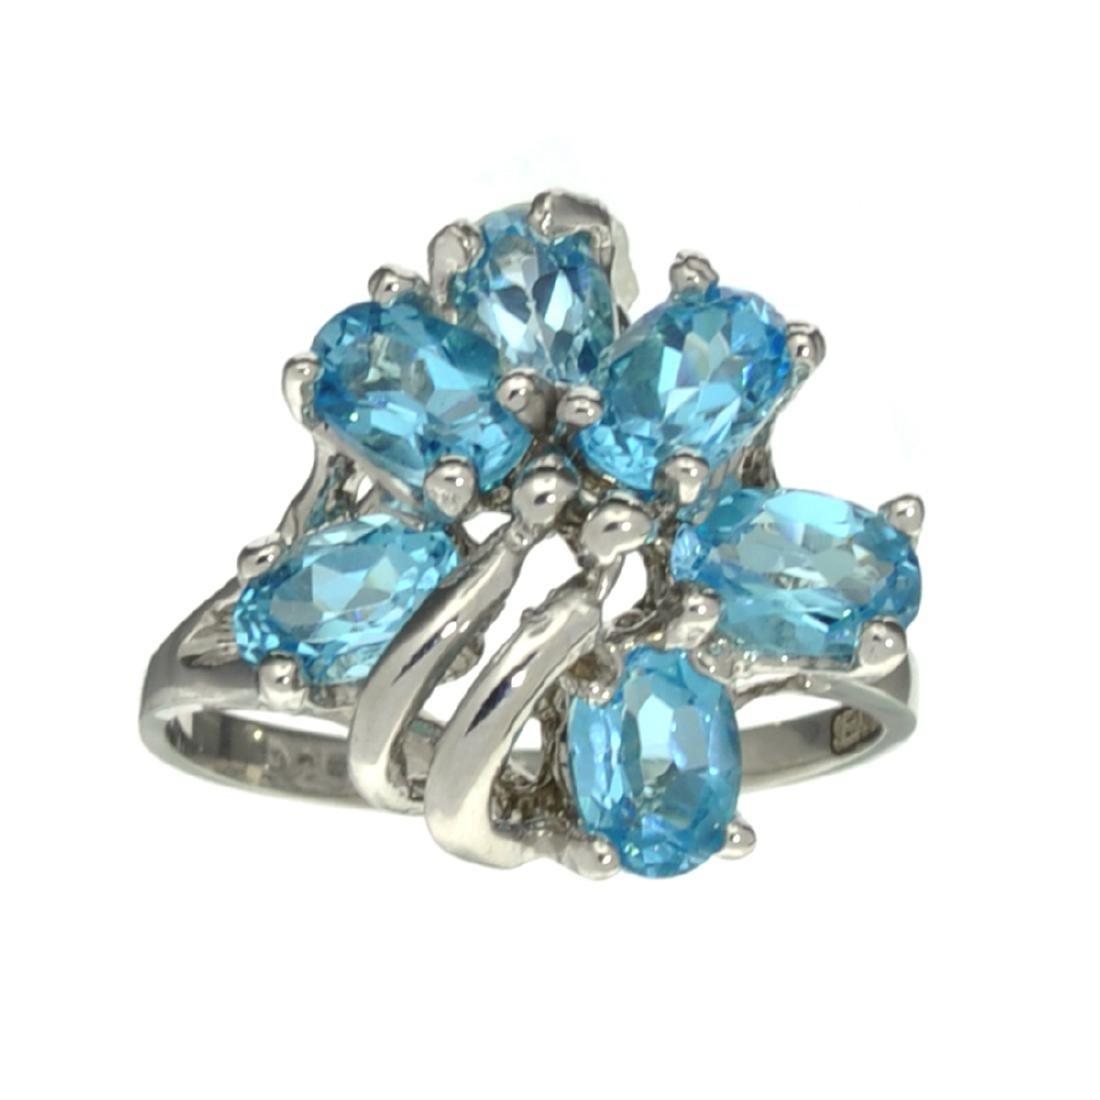 APP: 0.5k Fine Jewelry Designer Sebastian, 2.76CT Oval